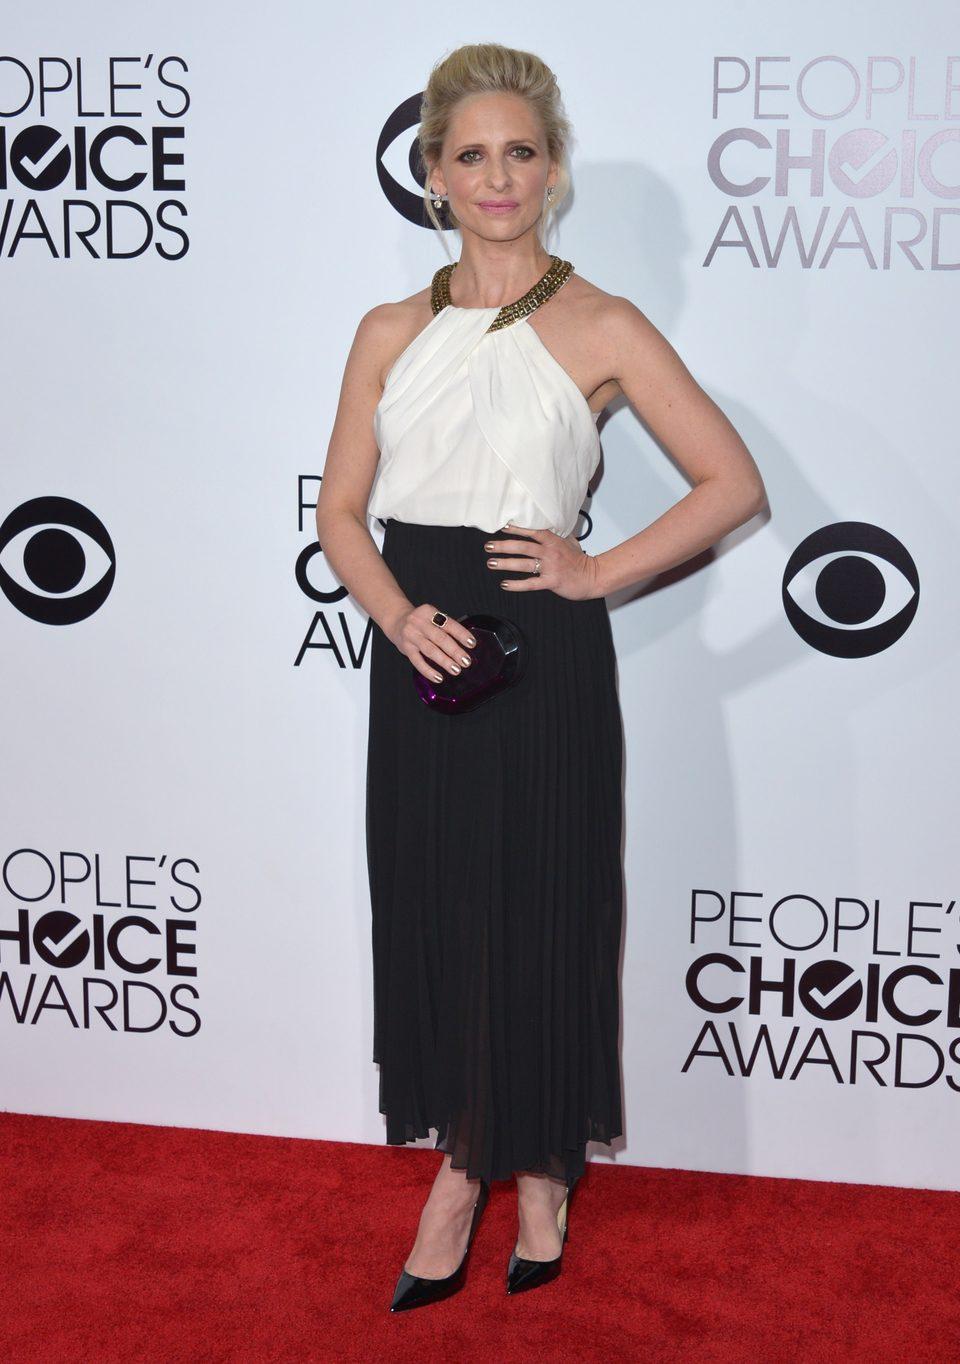 Sarah Michelle Gellar en los People's Choice Awards 2014